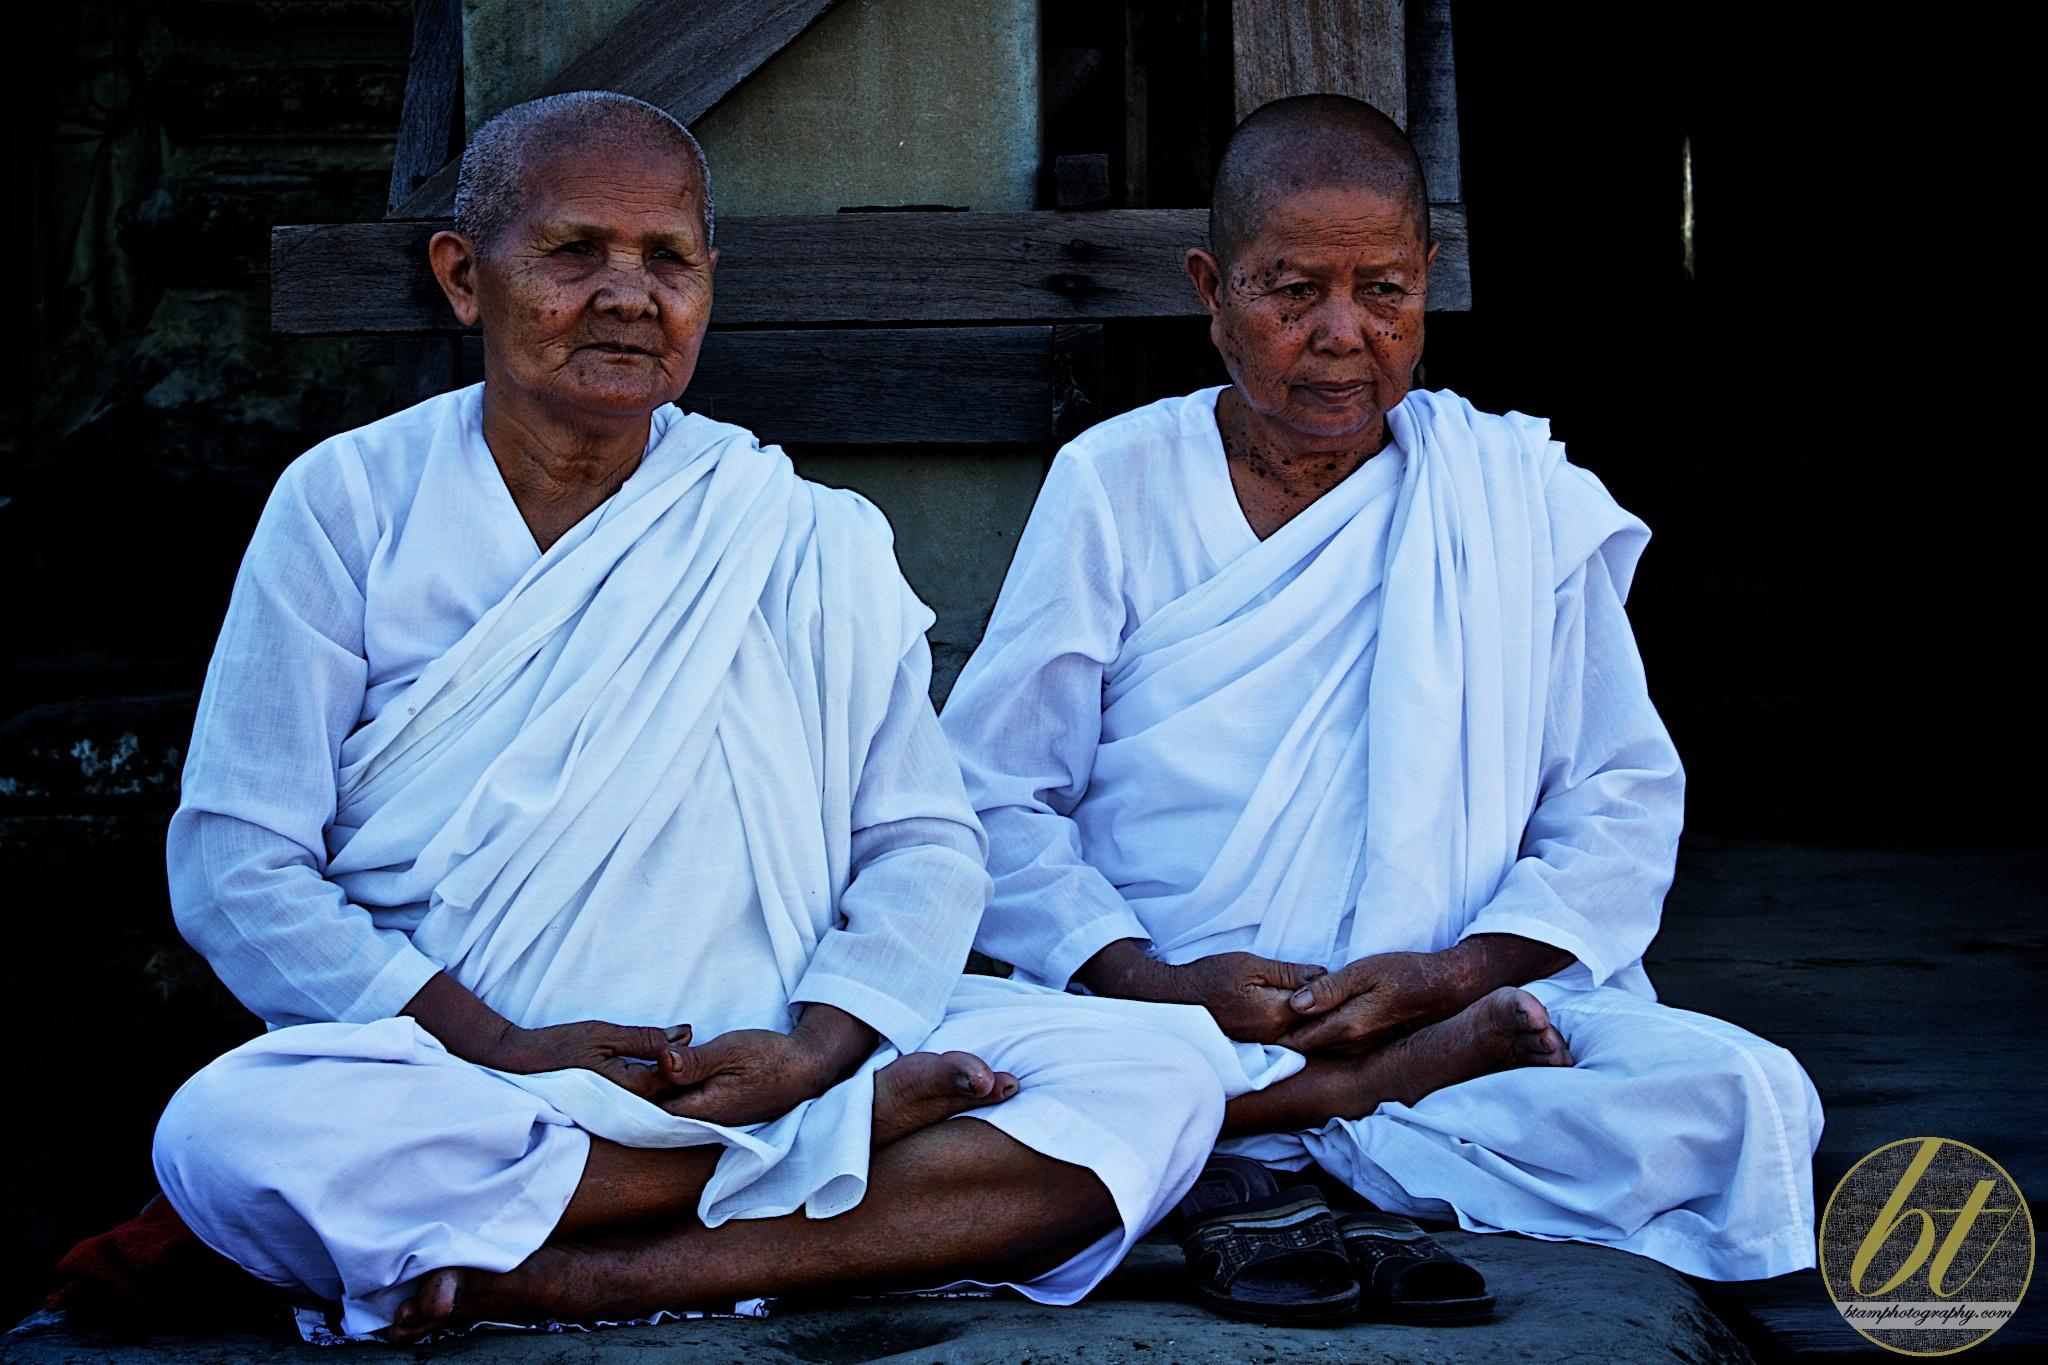 Angkor Wat's female monks